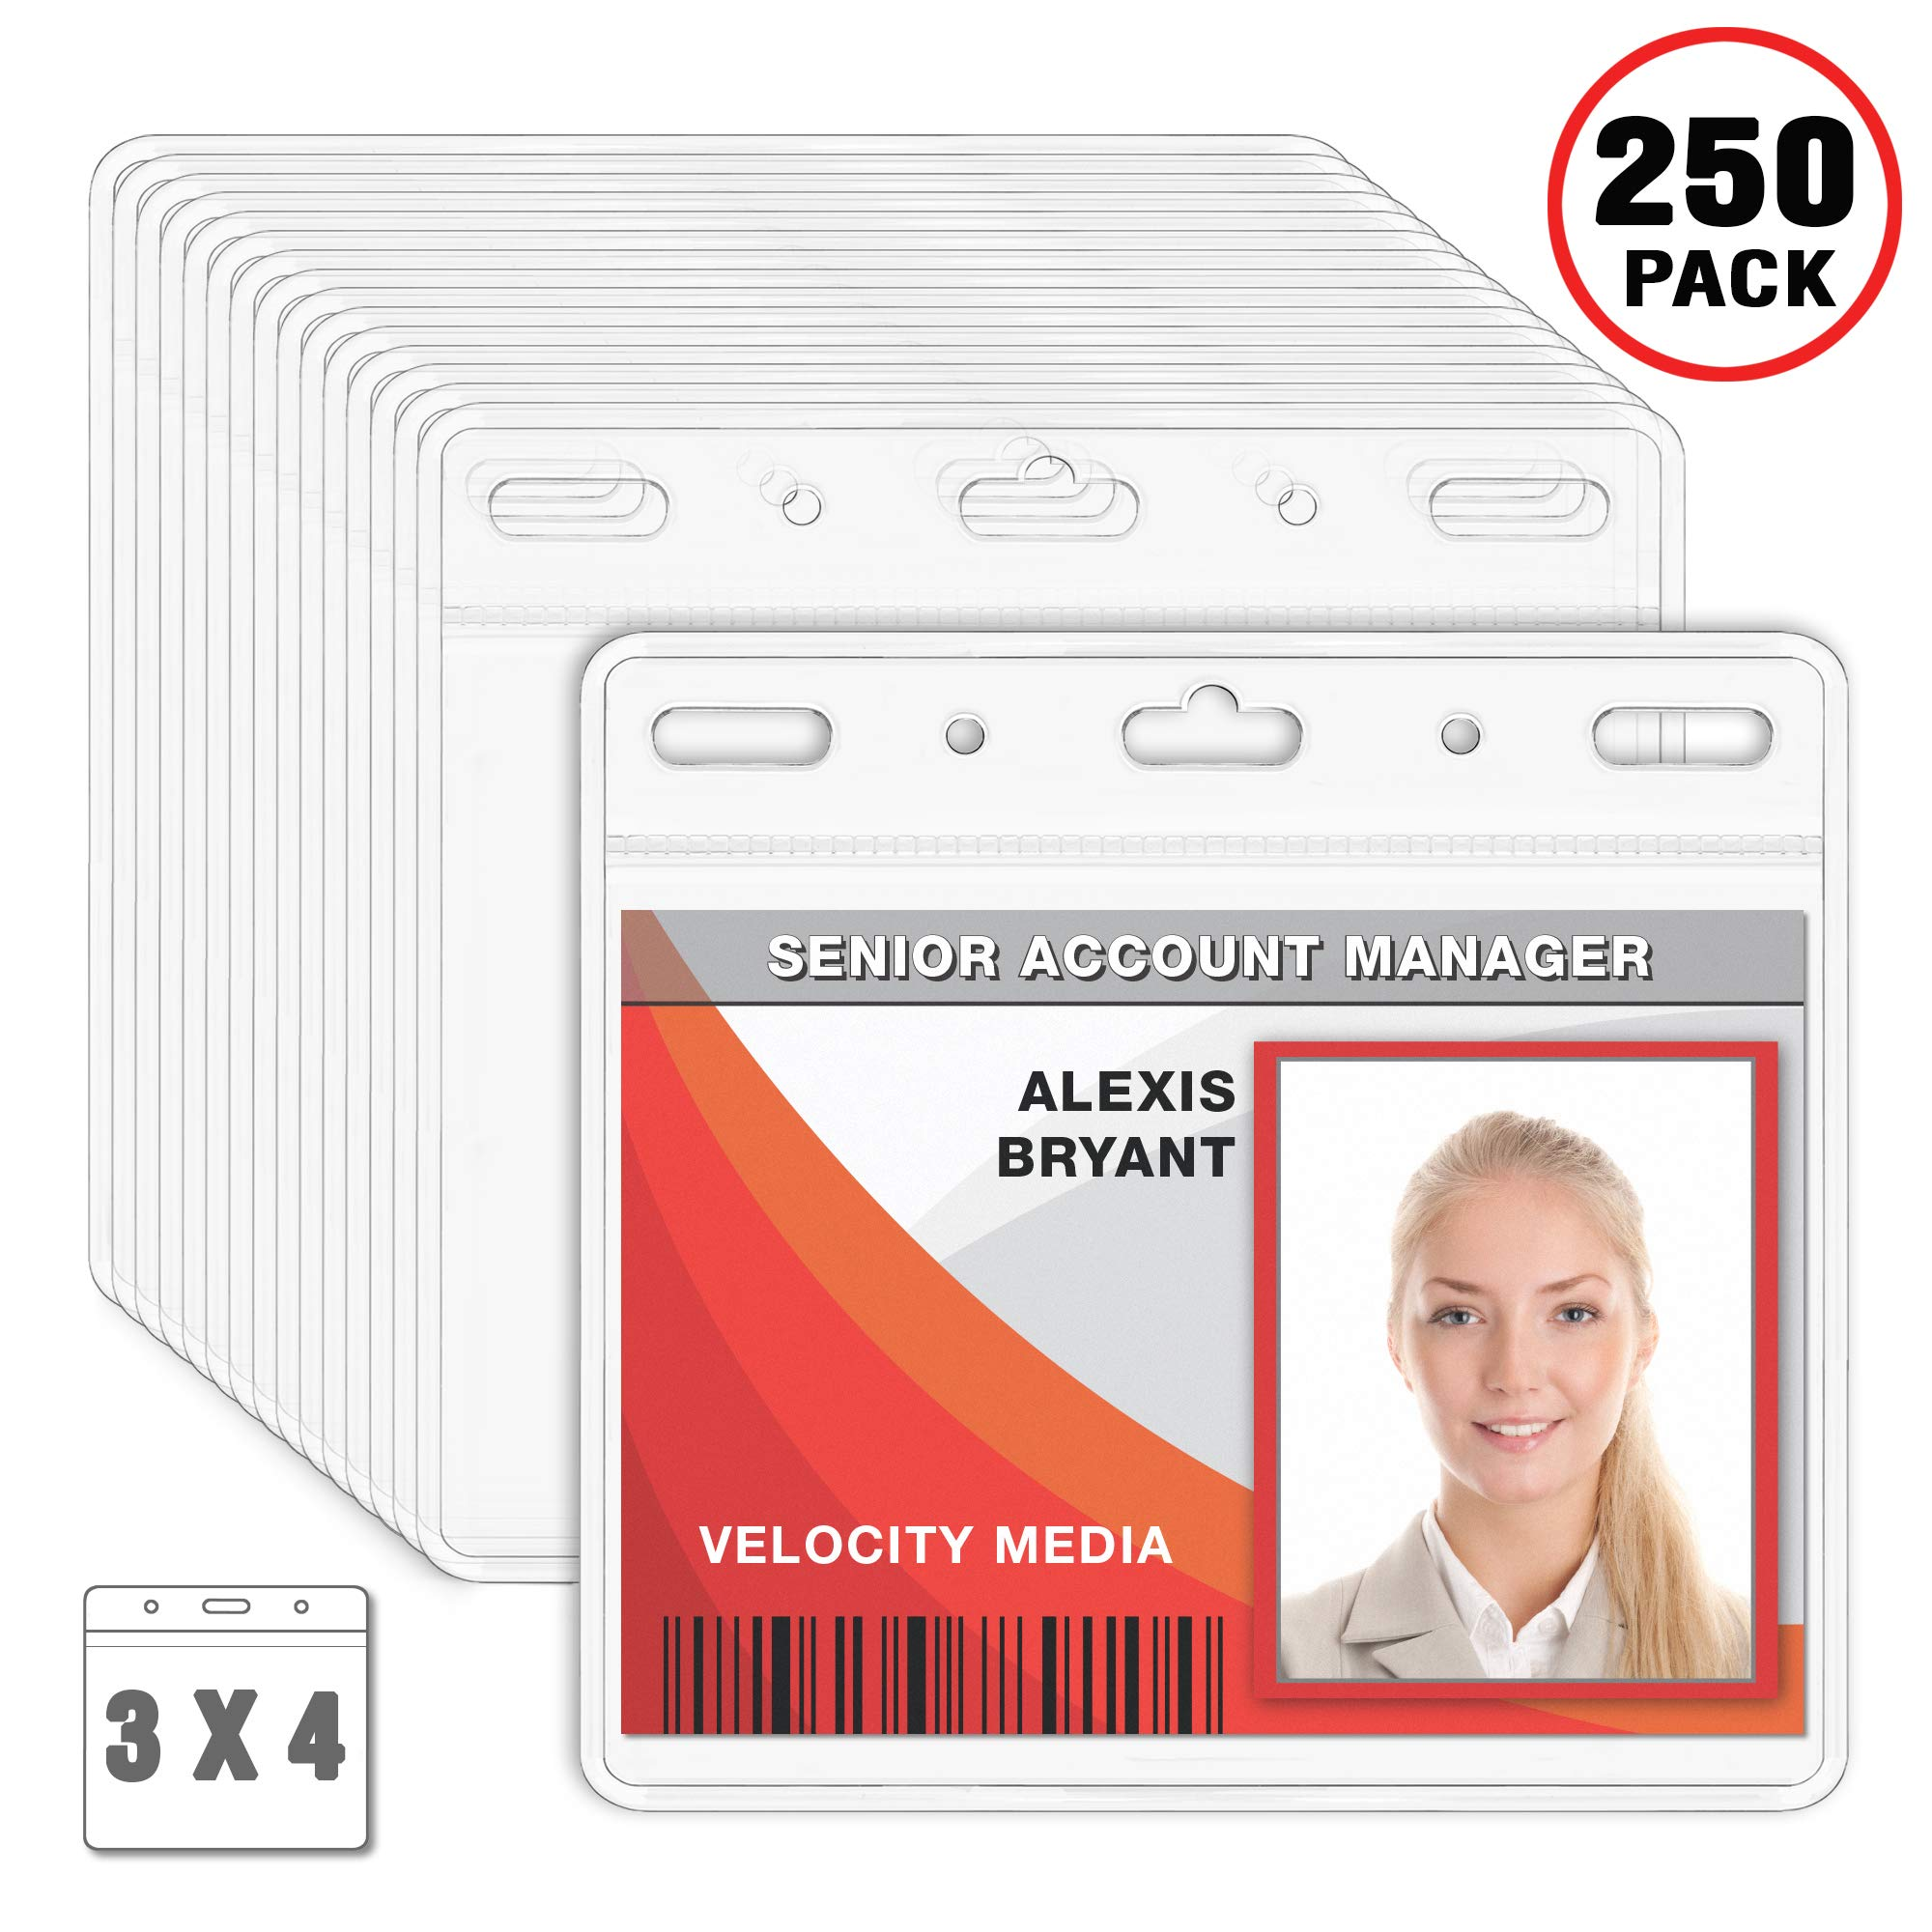 MIFFLIN Plastic Card Holder Horizontal 3x4 Inch Quick Load No Zipper Name ID Badge Clear Bulk 250 Pack